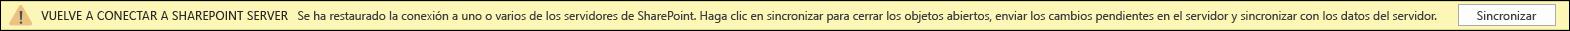 Haga clic en sincronizar para volver a conectar con el servidor de SharePoint.